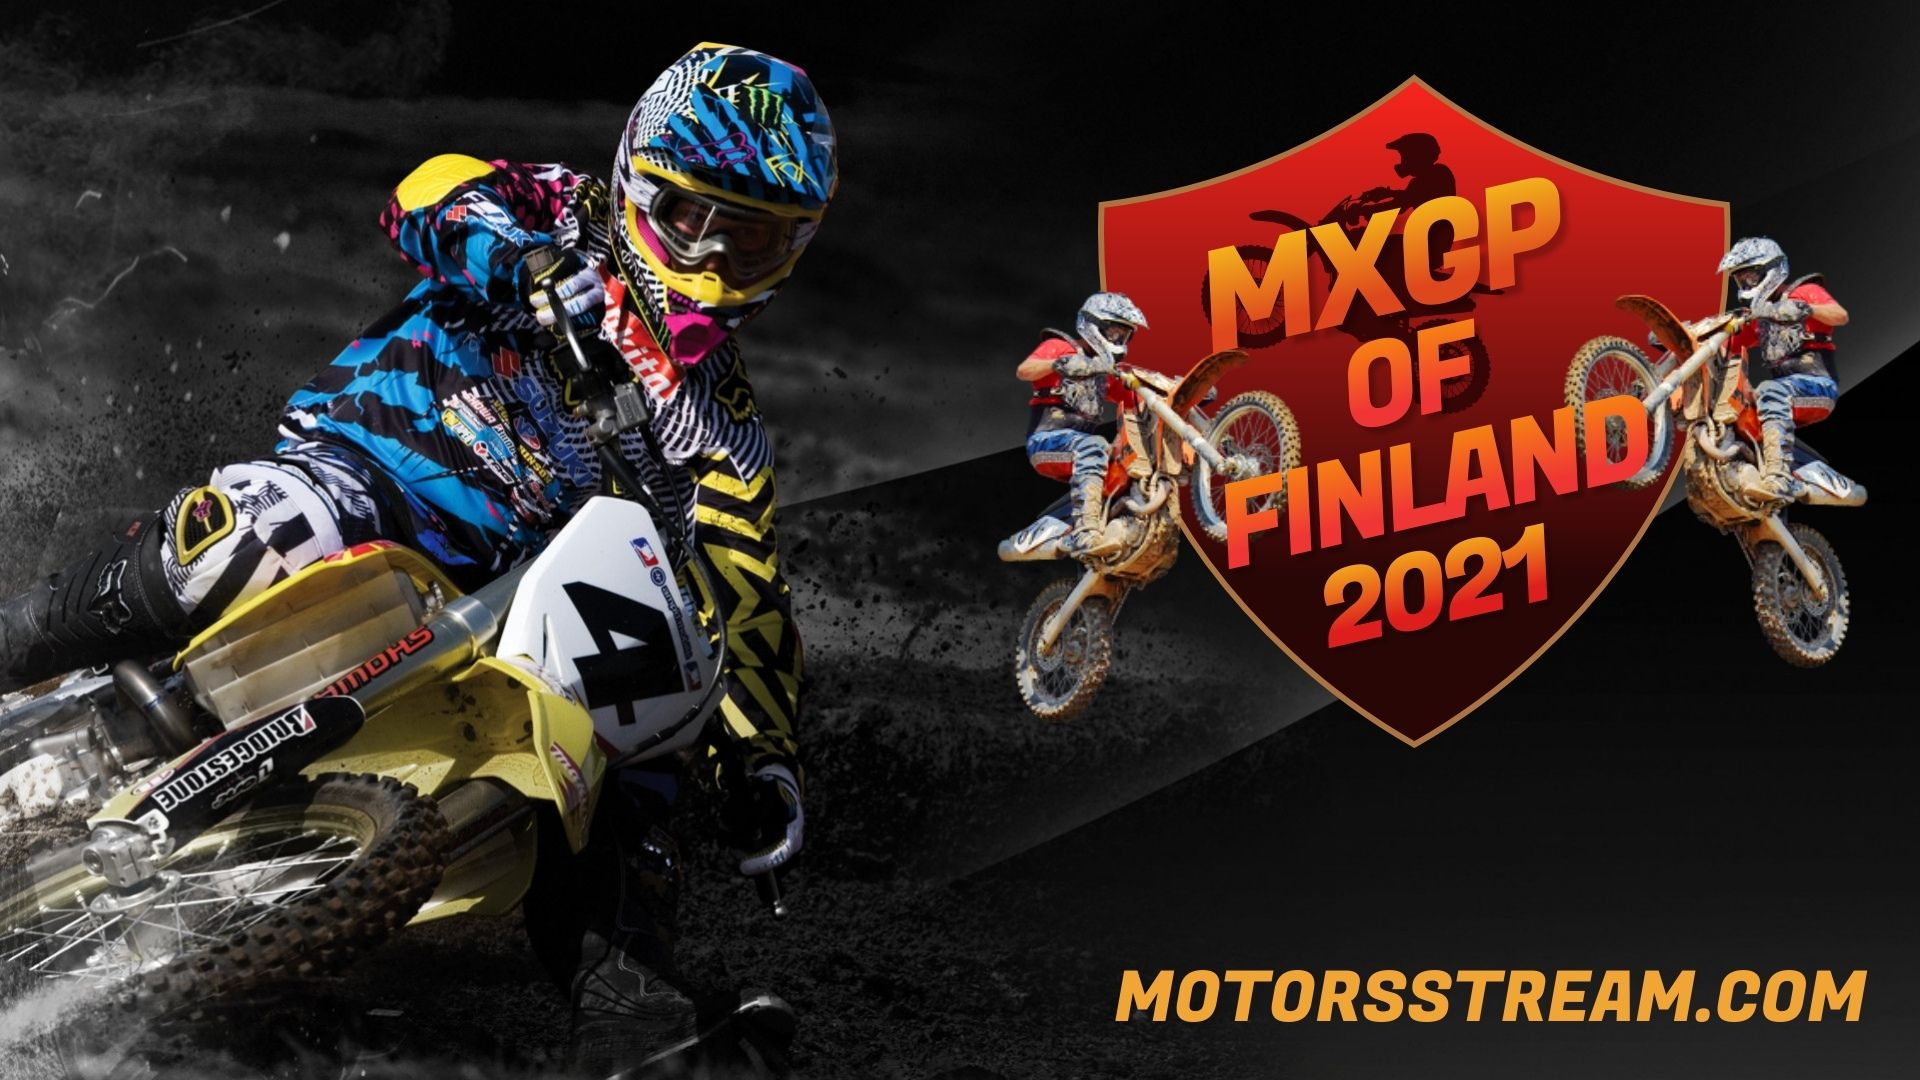 FIM Motocross WC Finland Live Stream 2021 | MXGP